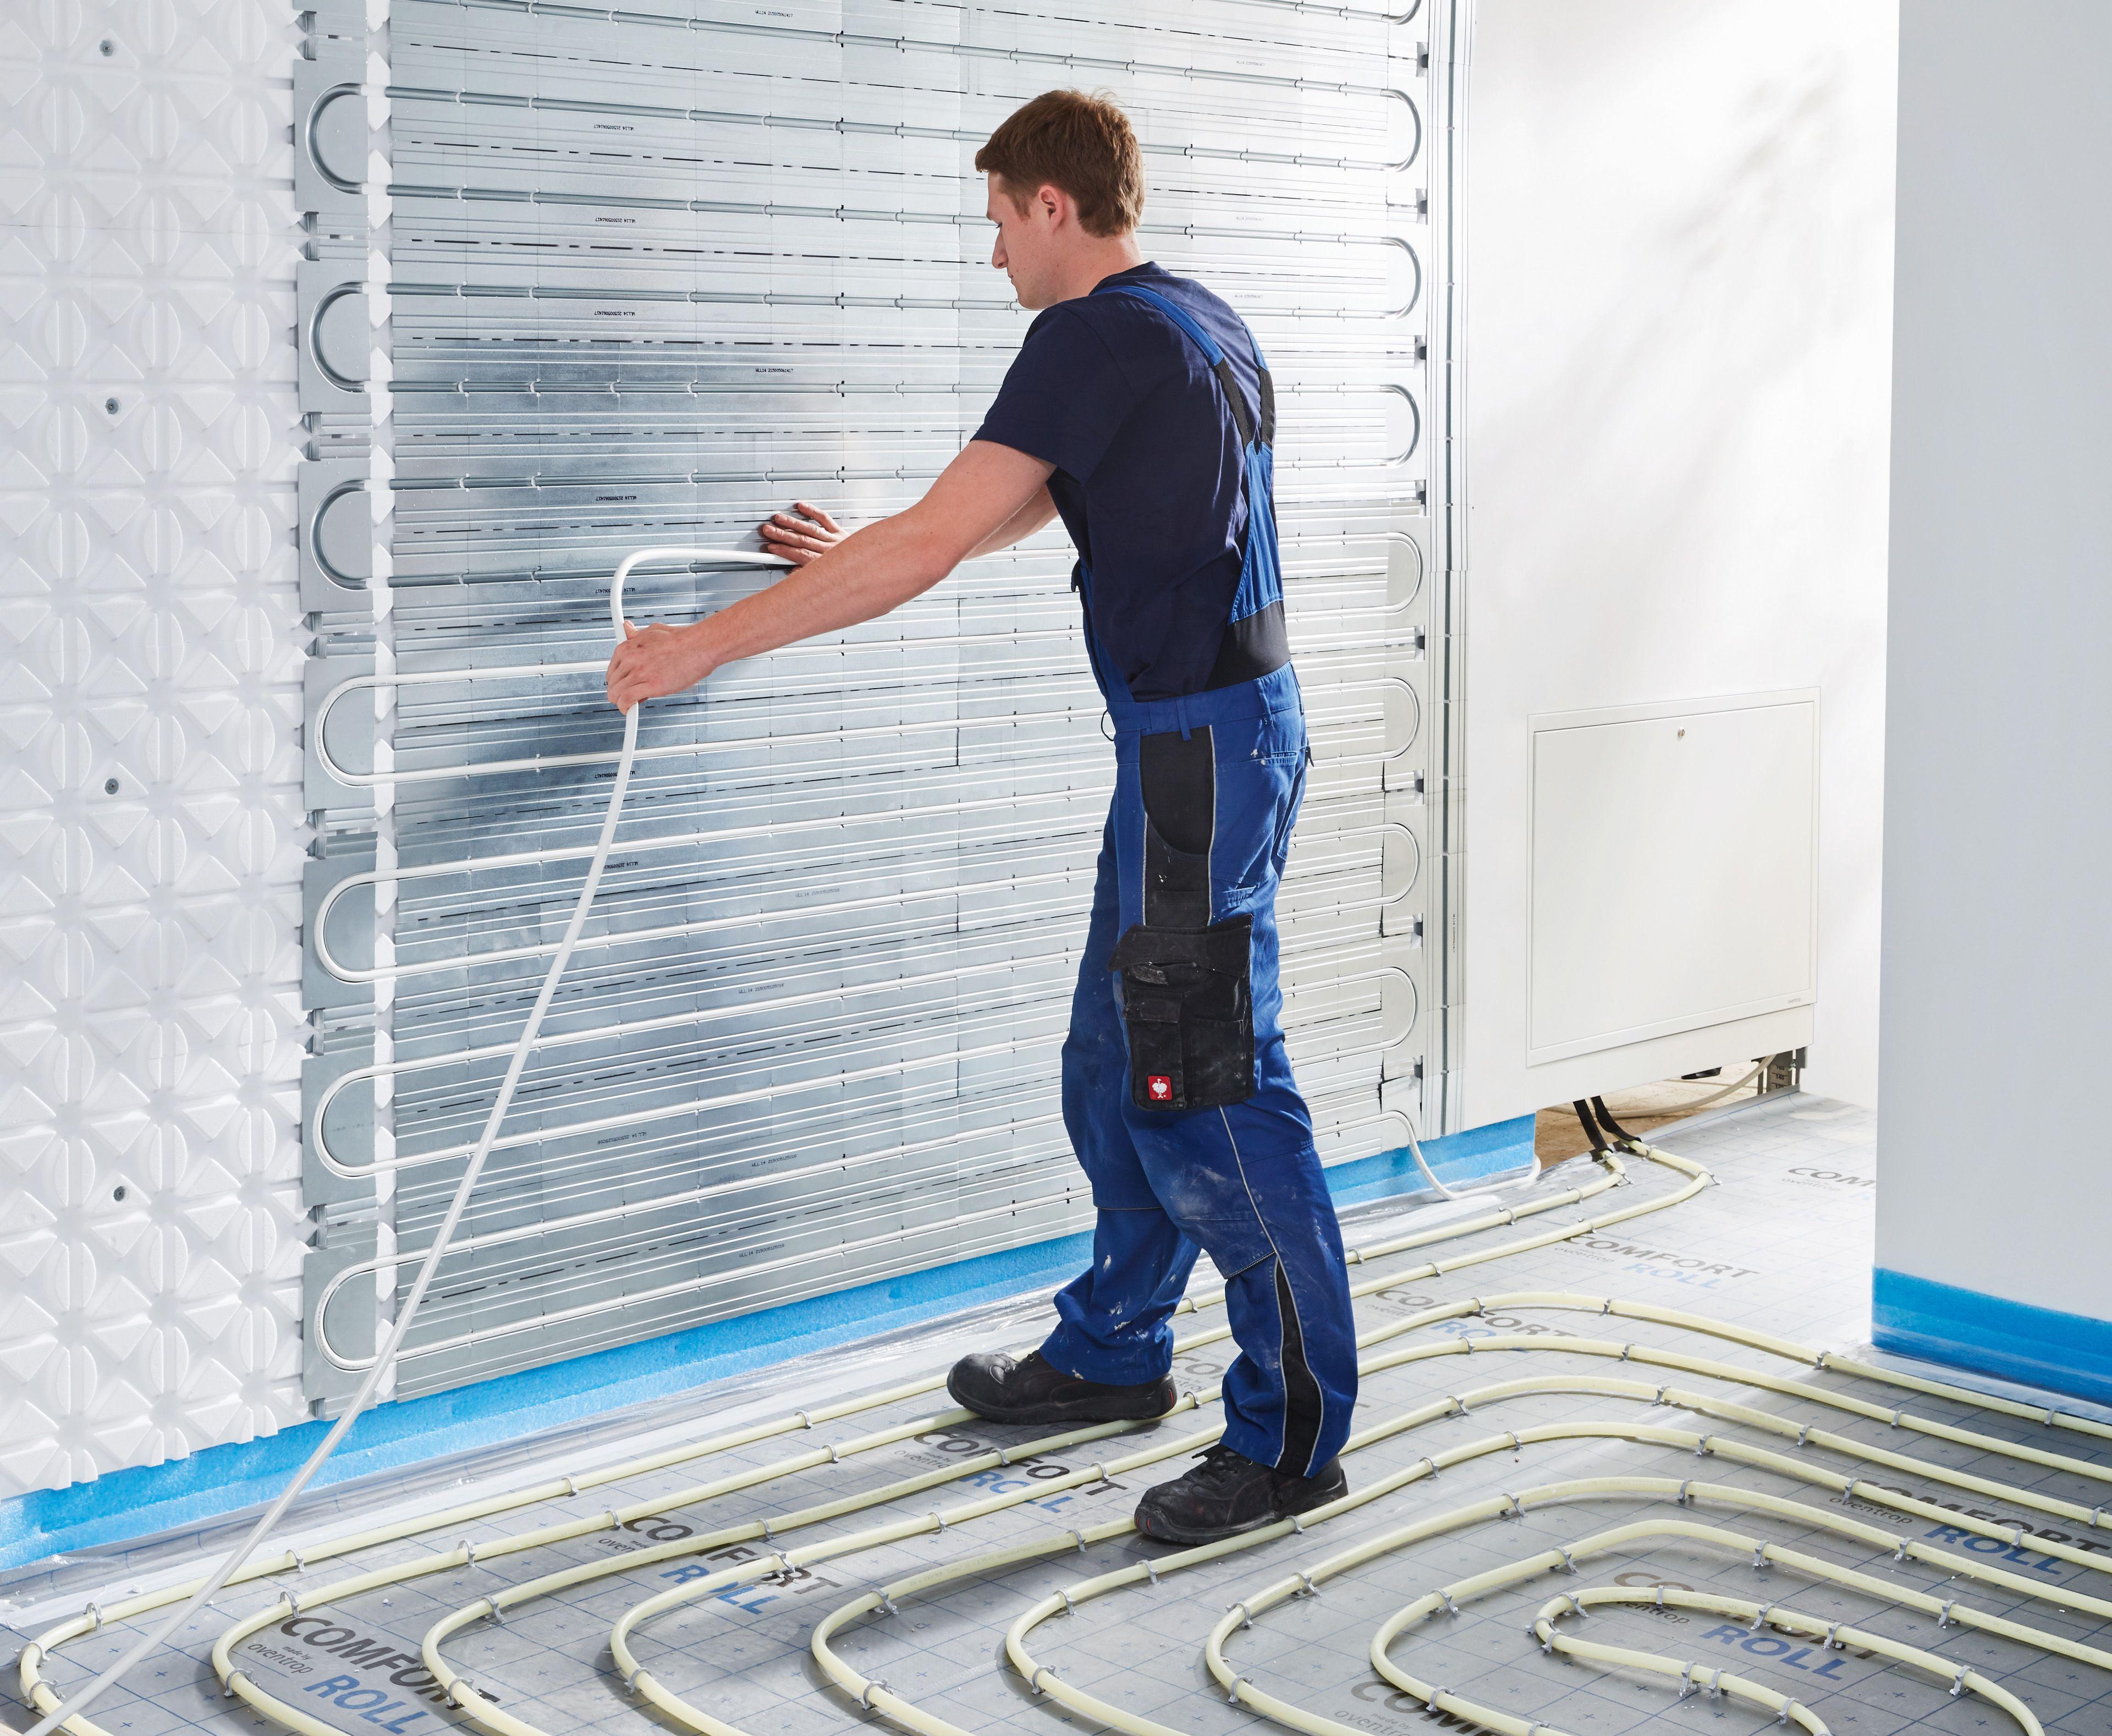 Sanibel Comfort Roll Optimierte Flachenwarme Und Kuhlung Heizkosten Sparen Haustechnik Flachenheizung